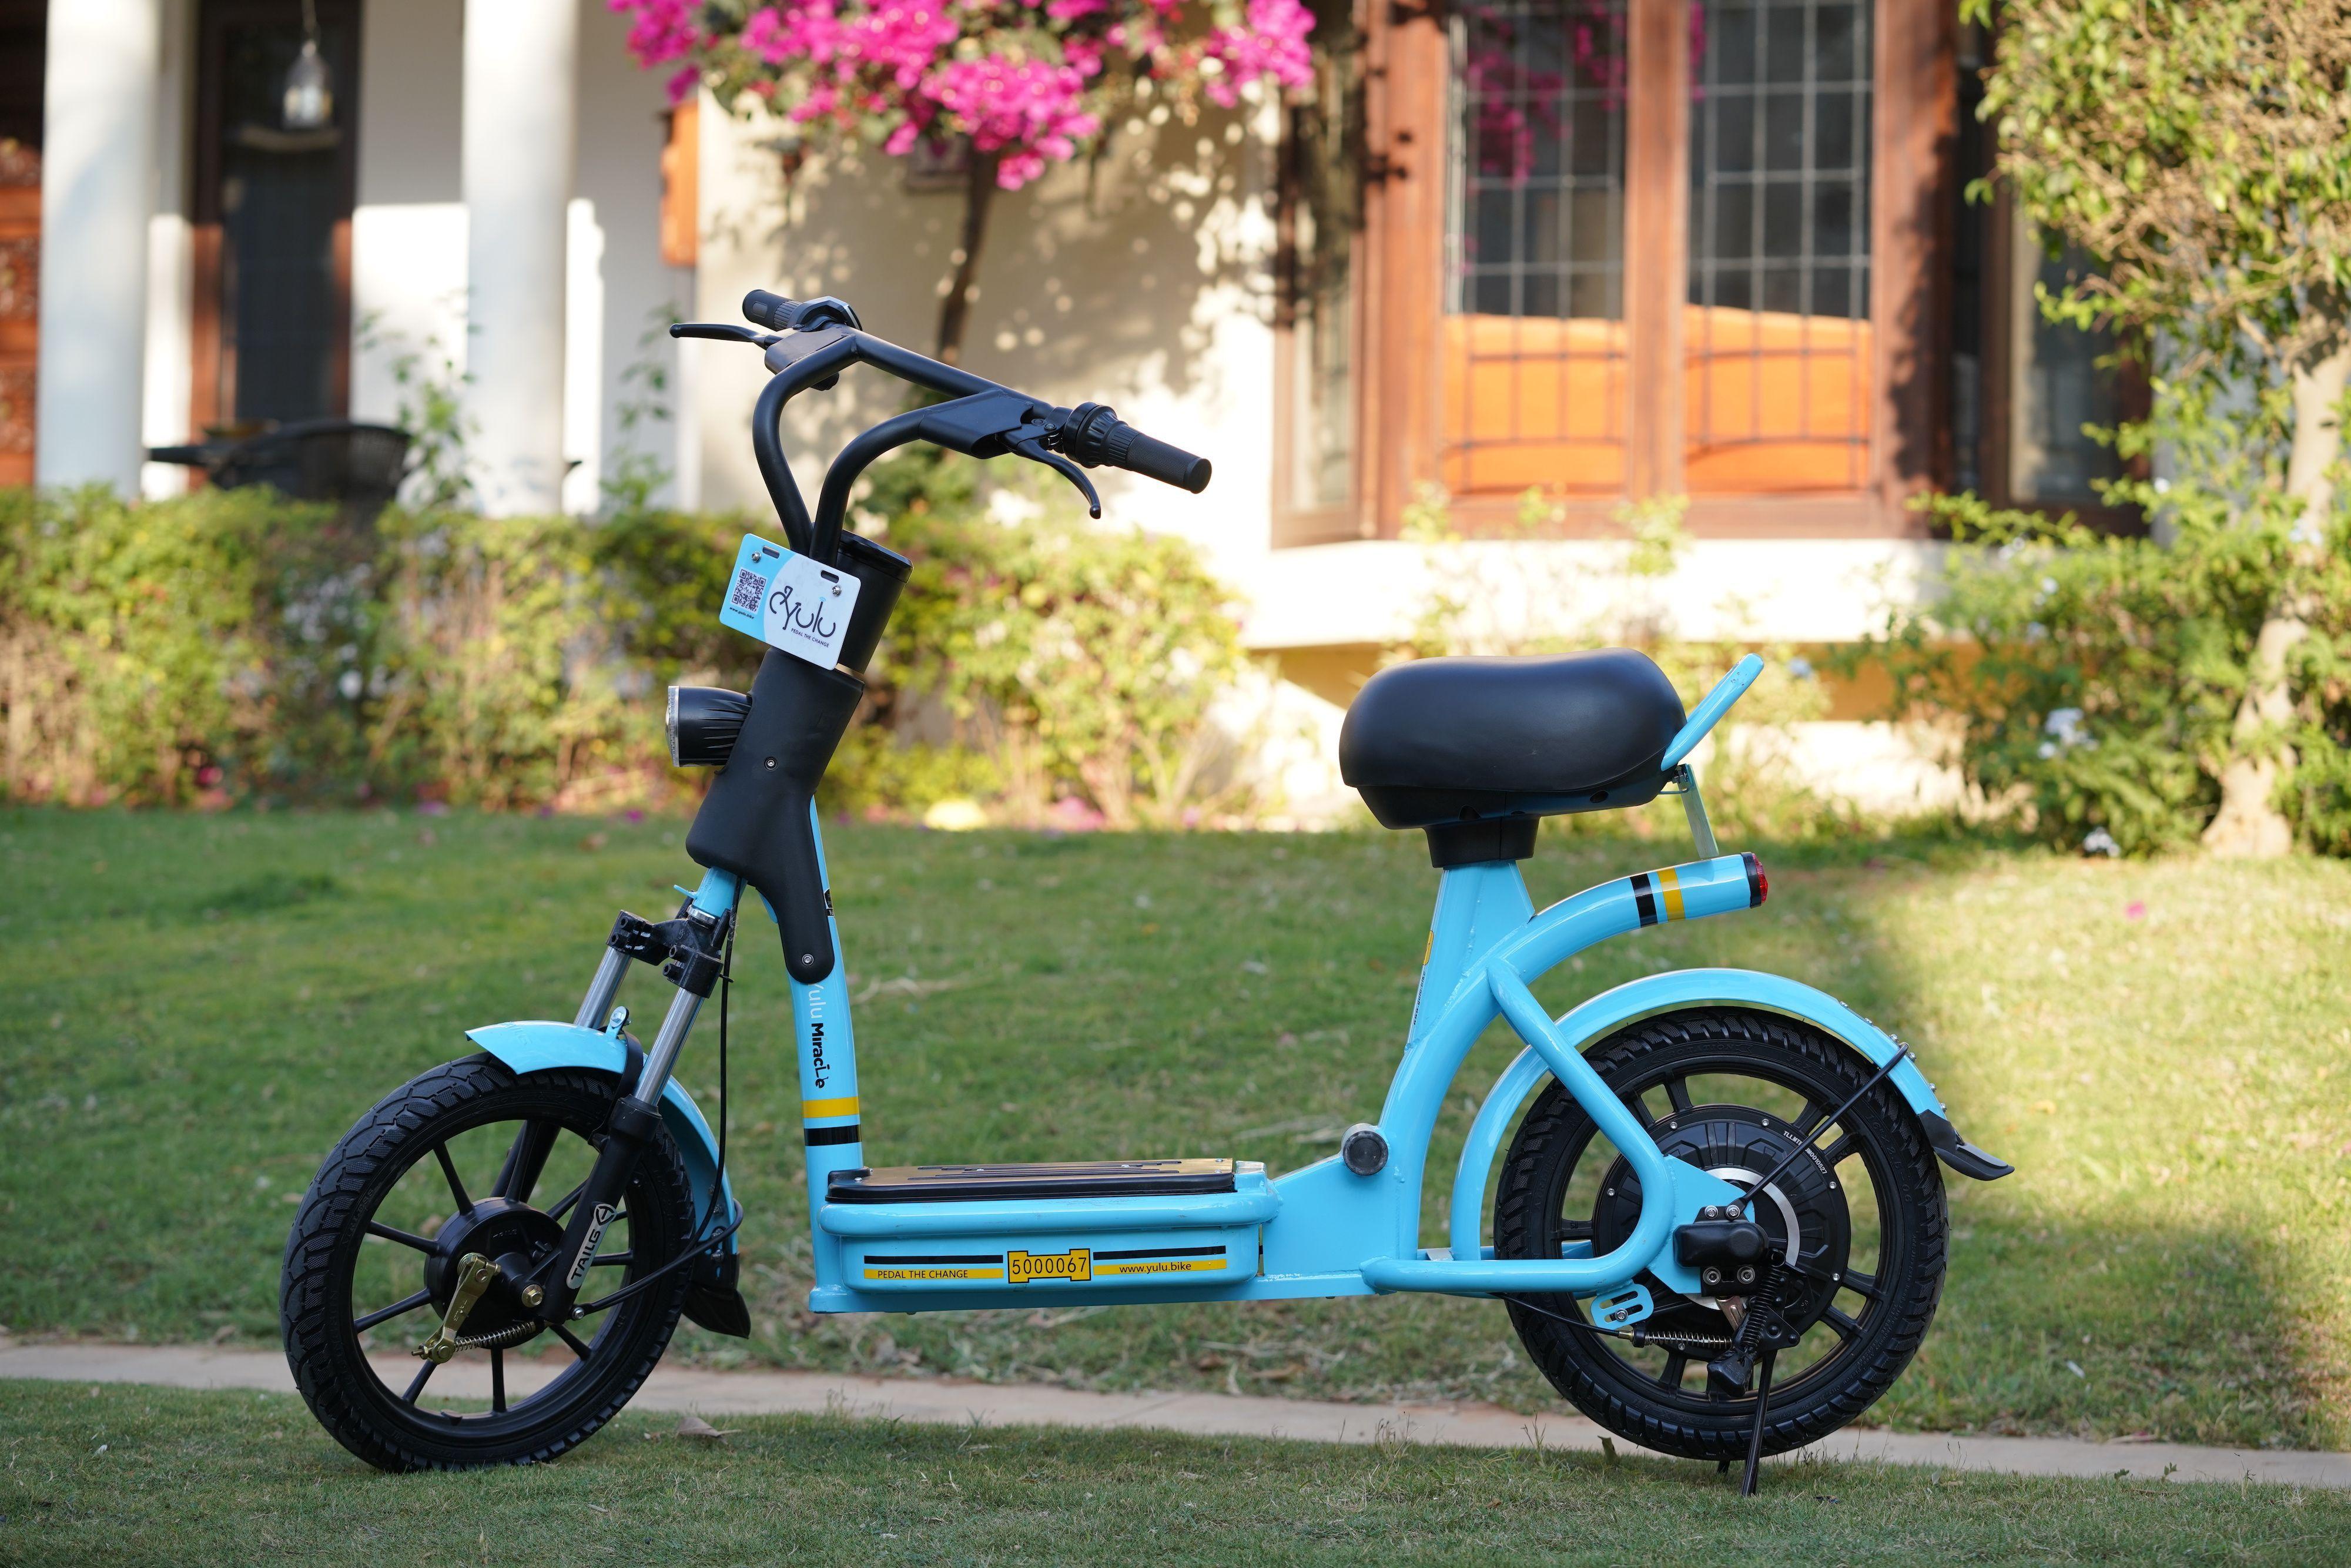 India S Electric Bike Rental Startup Yulu Inks Strategic Partnership With Bajaj Auto Raises 8m Bajaj Auto Electric Bike Bike Rental